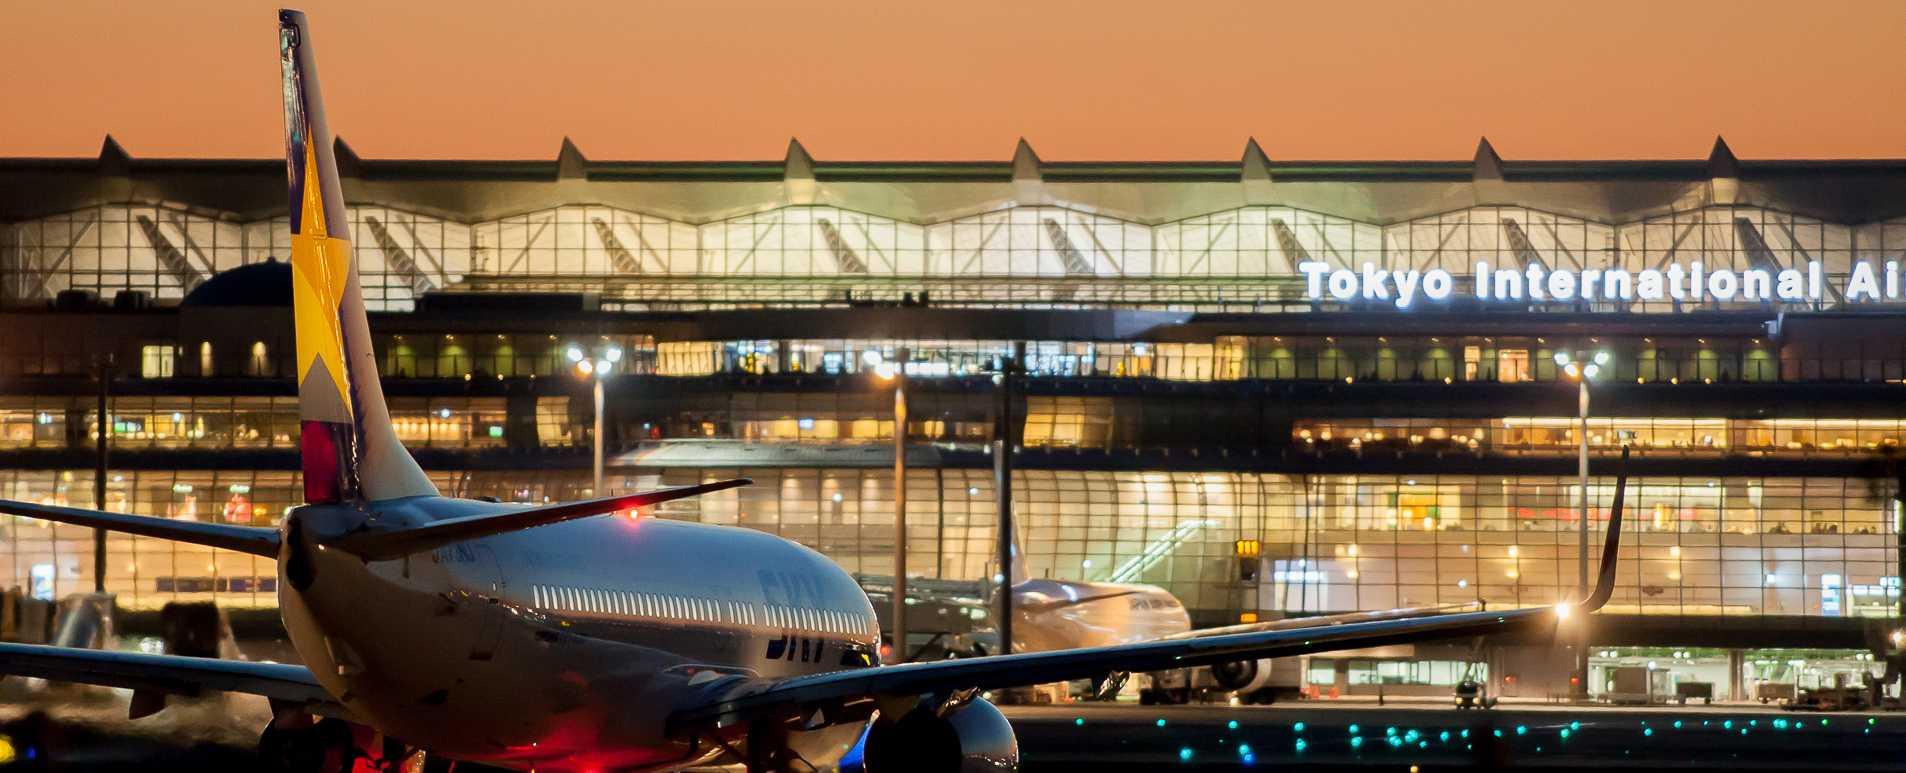 Международный аэропорт Ханеда в Японии